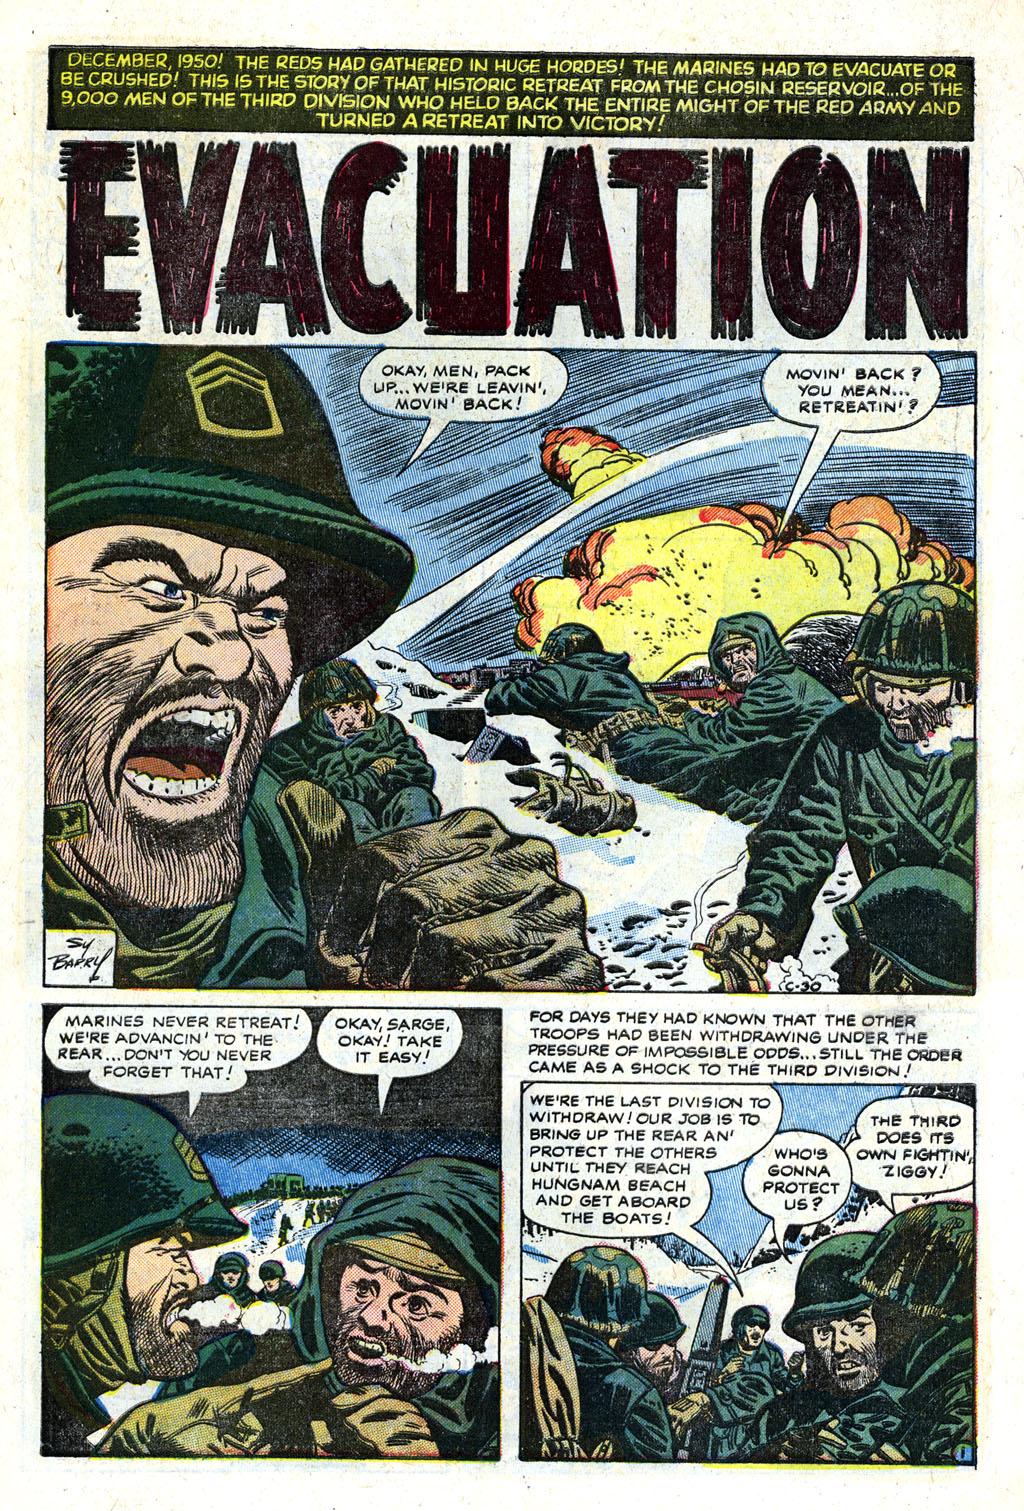 Man Comics (1949) #25 pg1, art by Sy Barry.